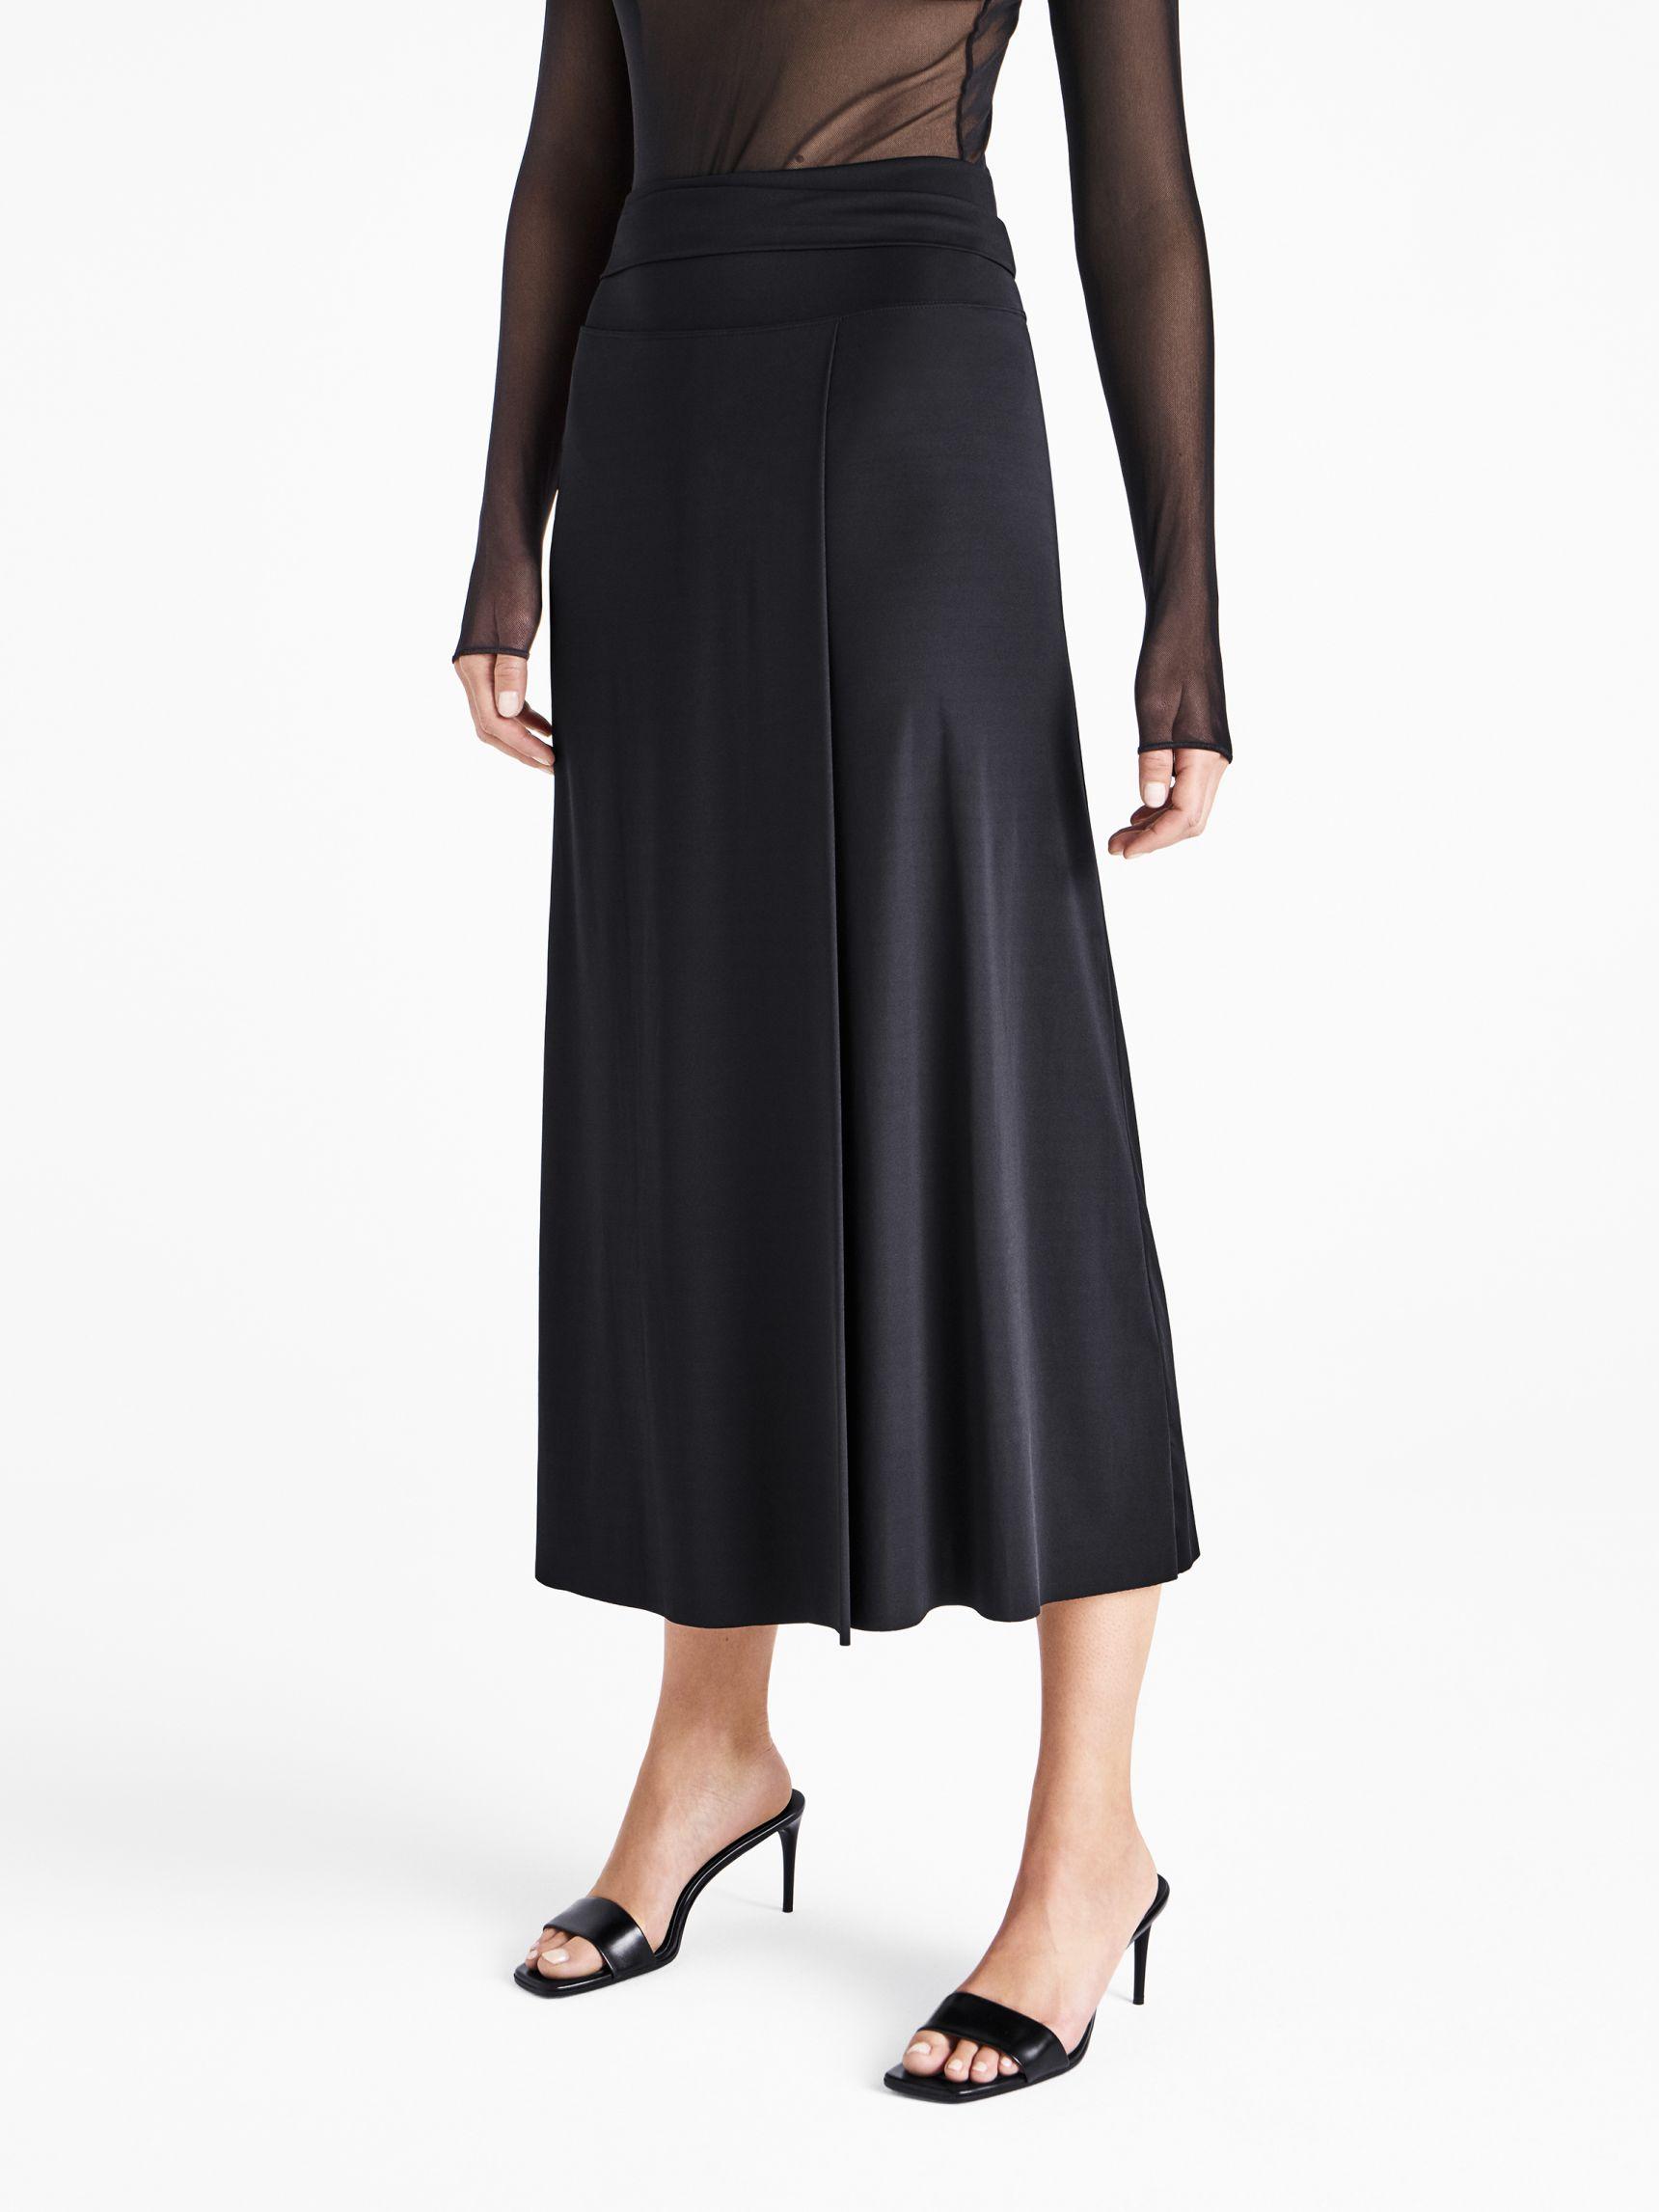 Honey Breeze Skirt